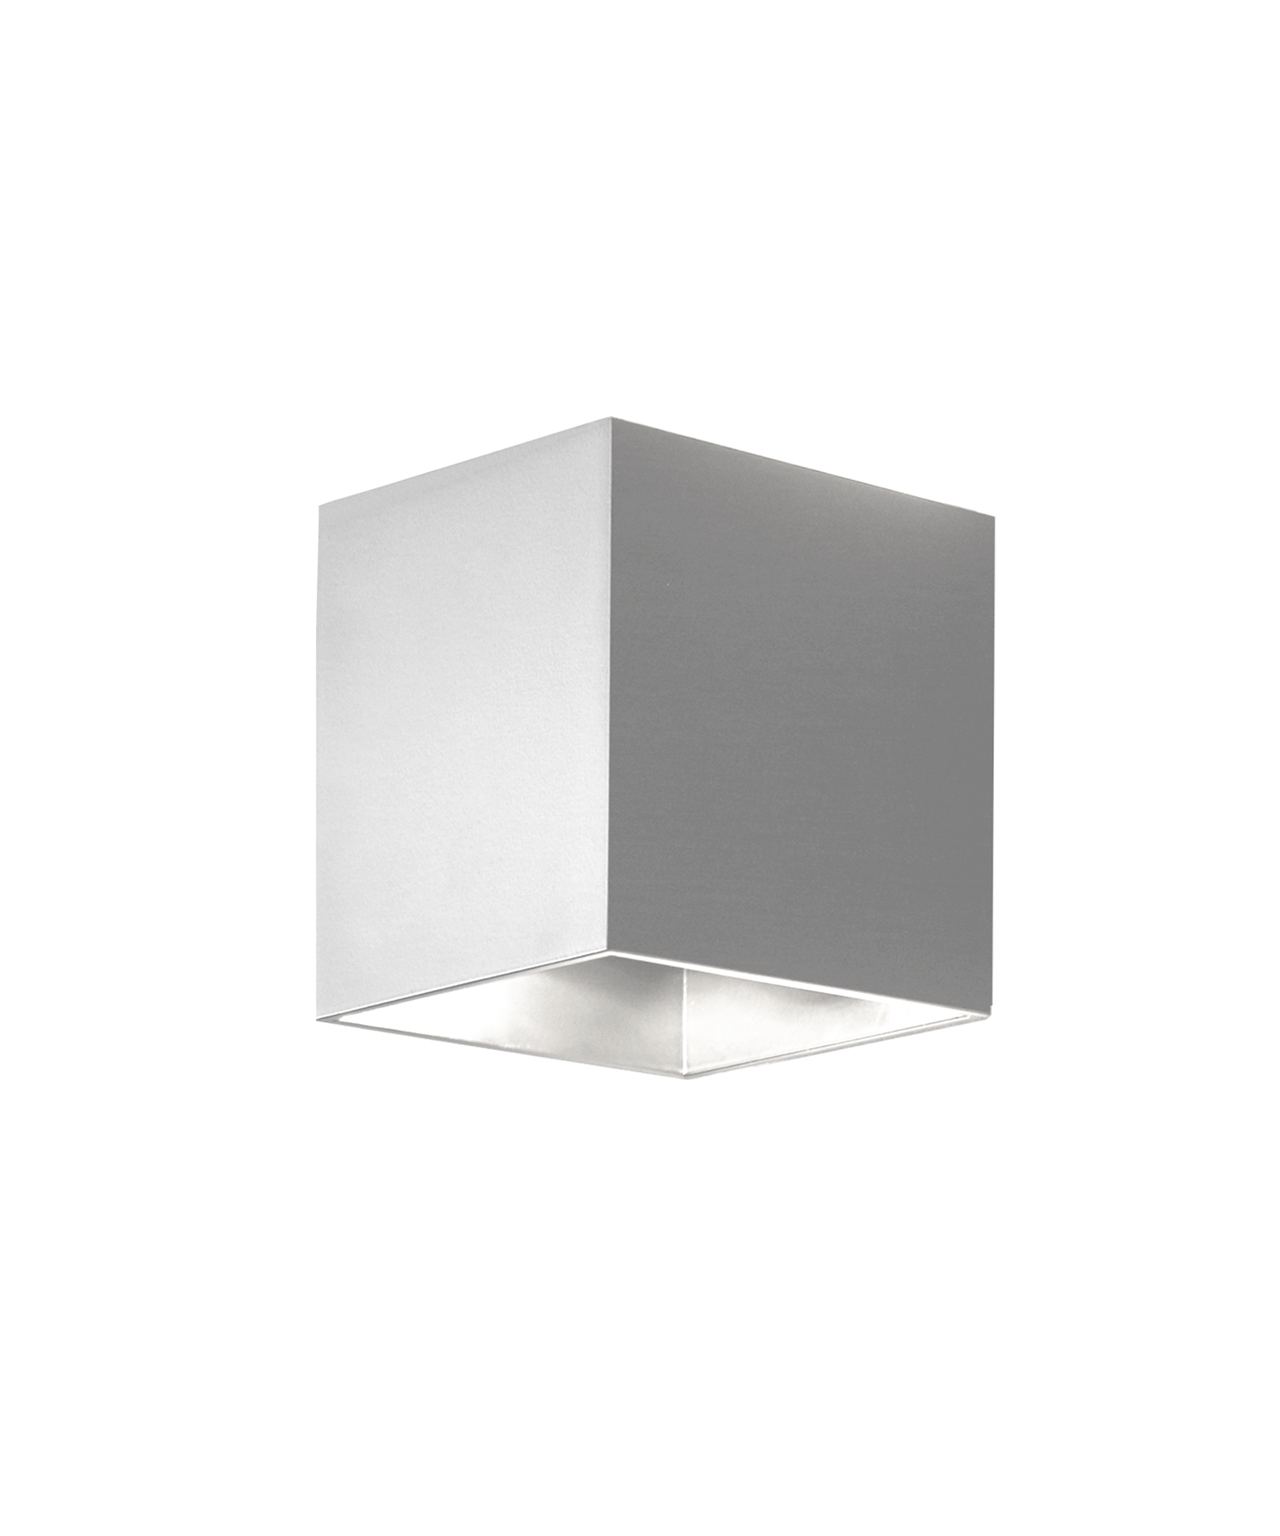 Copenhagen Cube Utomhus Vägglampa Vit - Aros Design